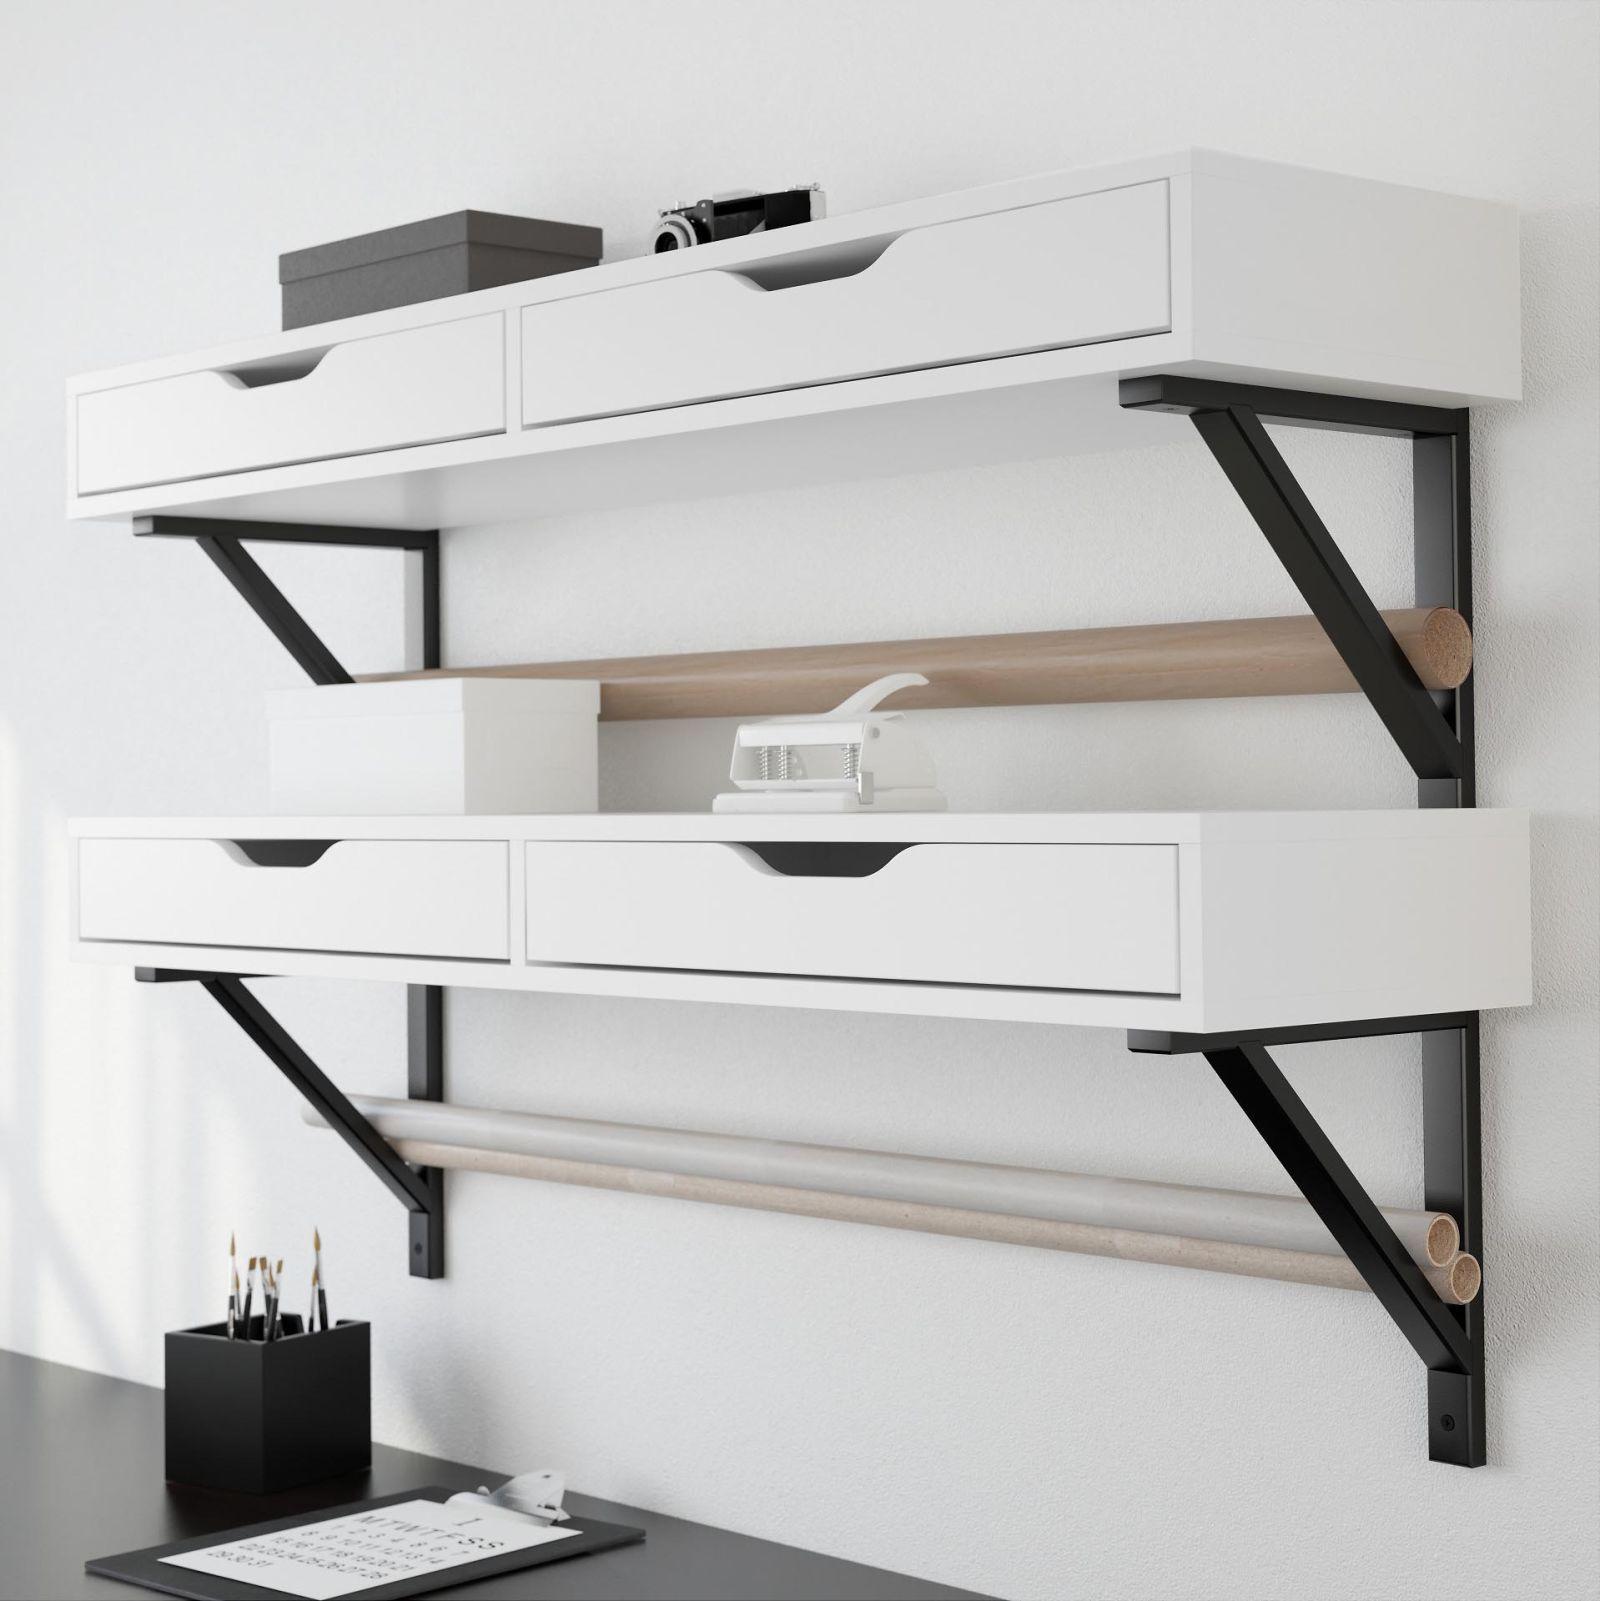 15 organizadores de Ikea que cambiarán tu vida Drawer